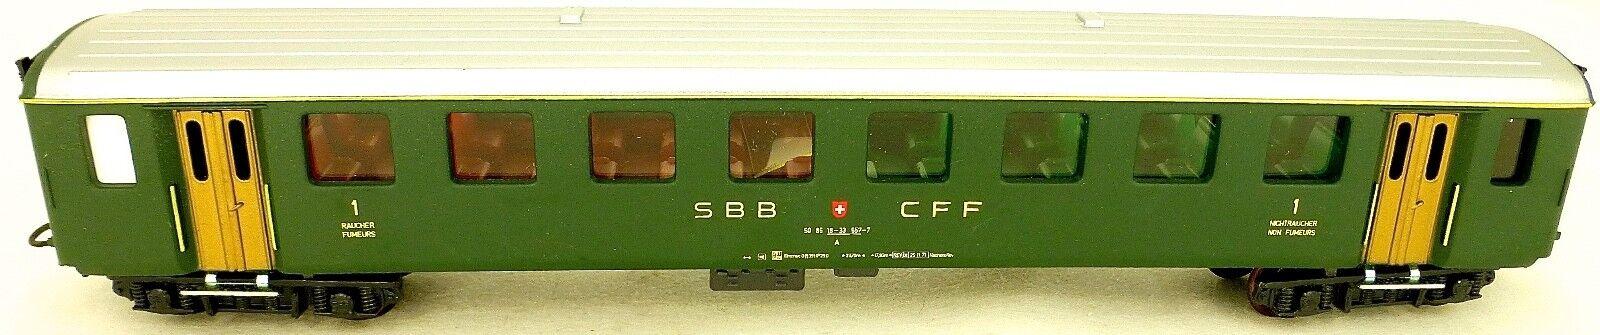 SBB Cff Carroza a 50 85 16-33 557-7 Hag 415 H0 1 87 Å